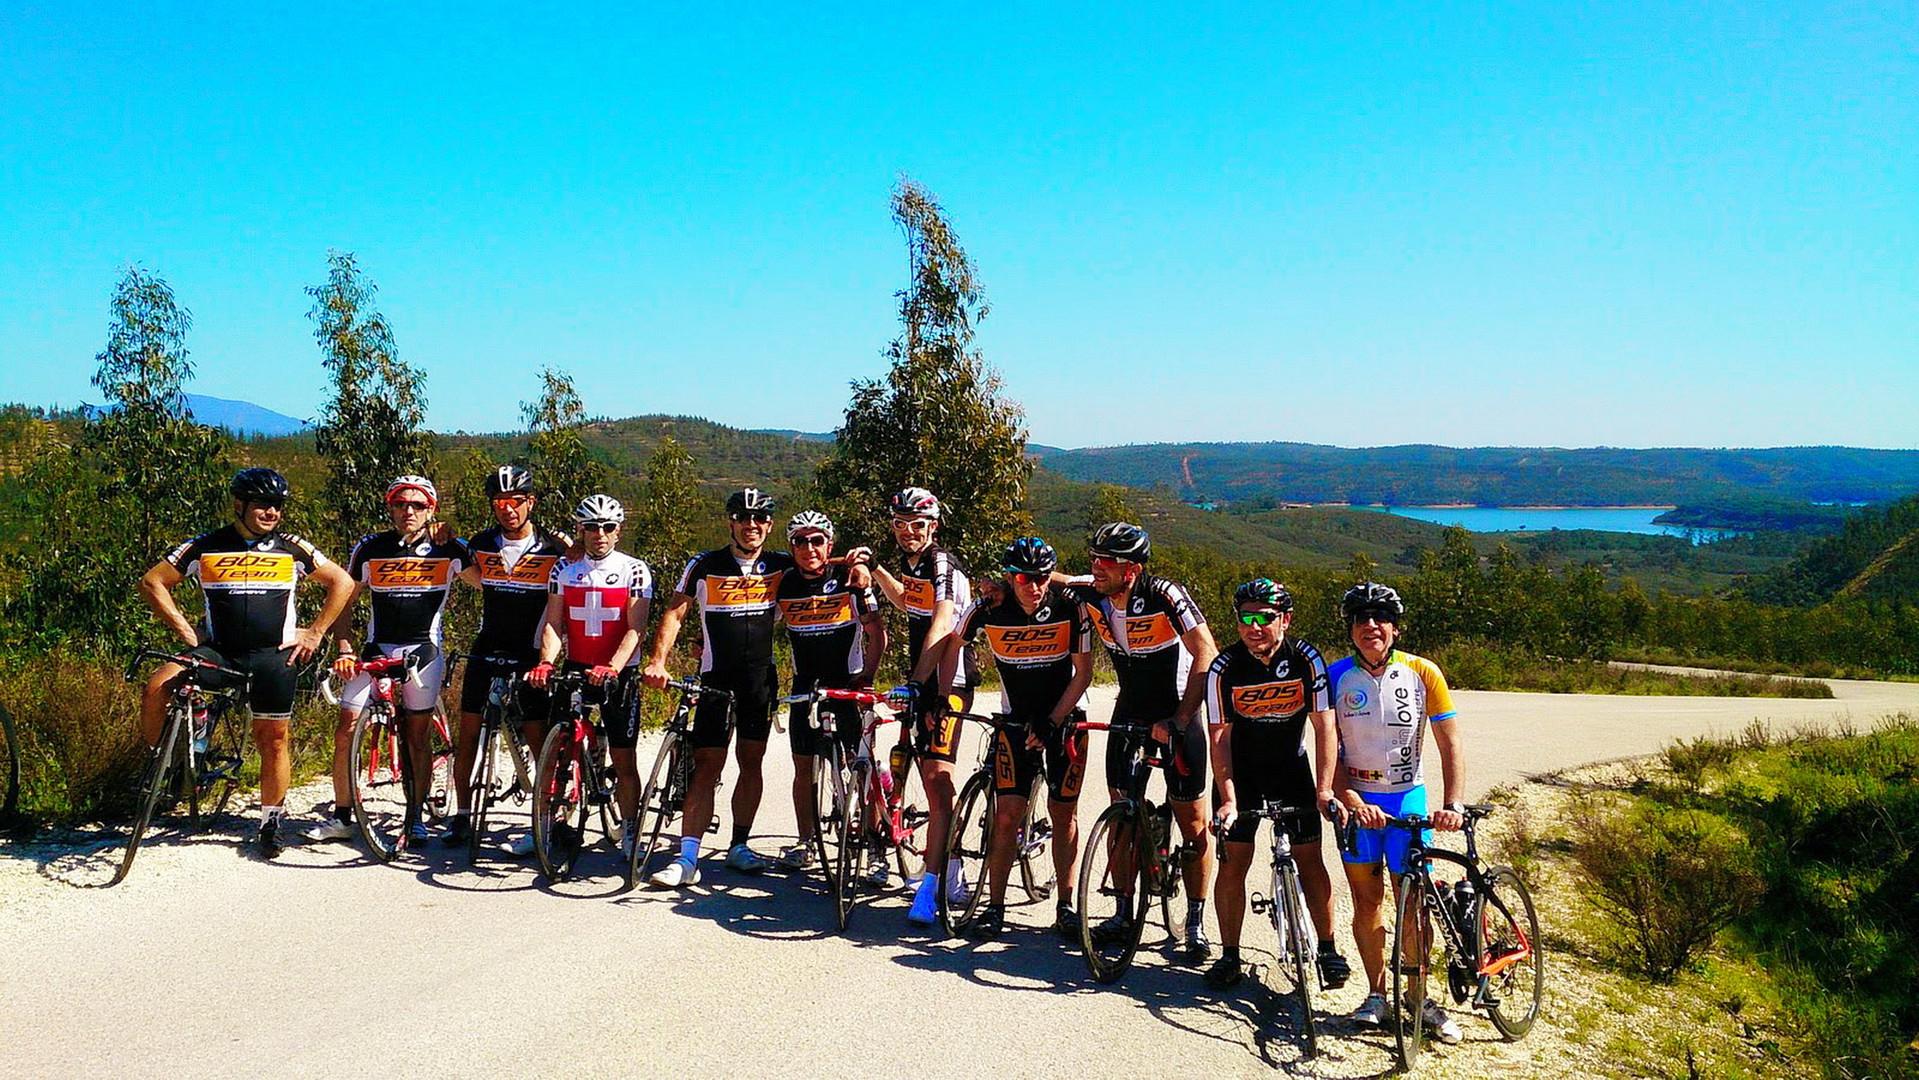 bike-tours-algarve-alg-ale_14.jpg